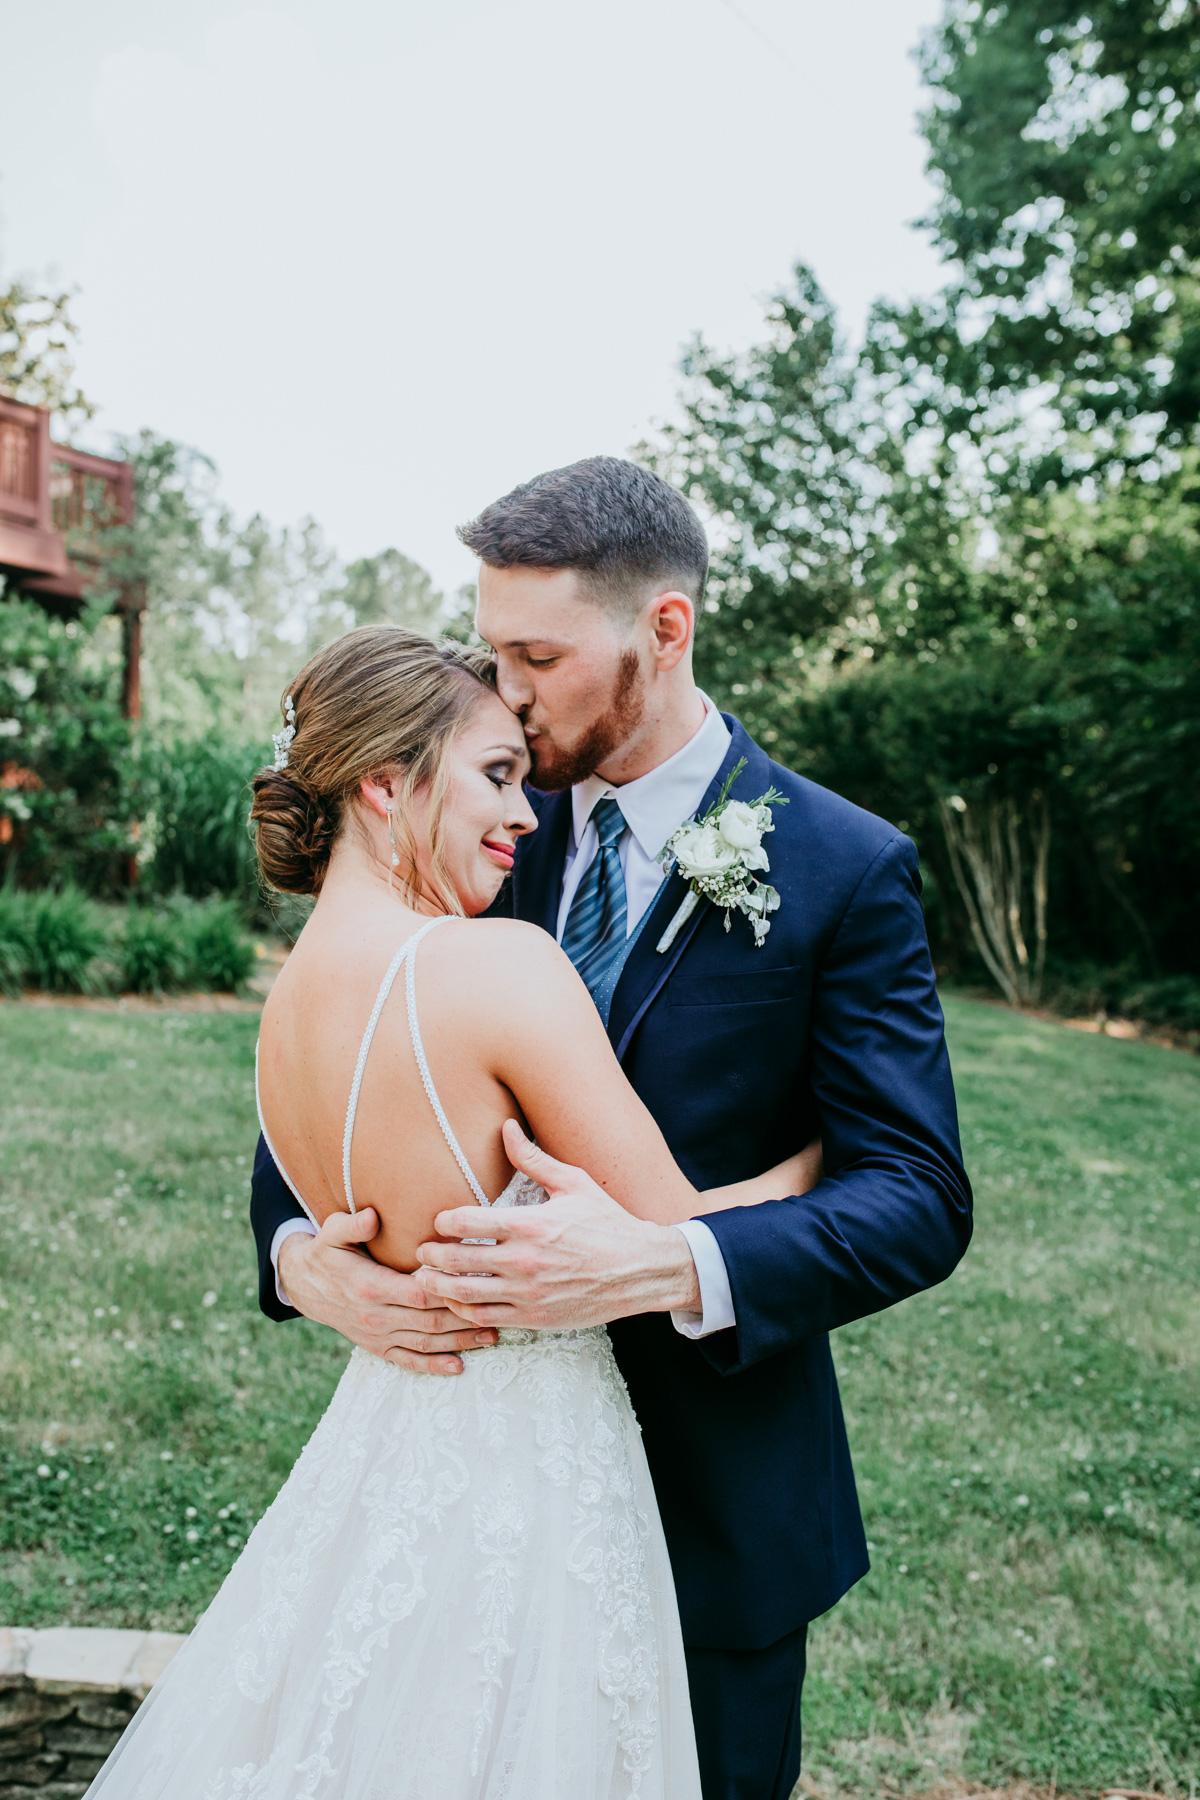 beautiful-wedding-photos-of-bride-and-groom.jpg